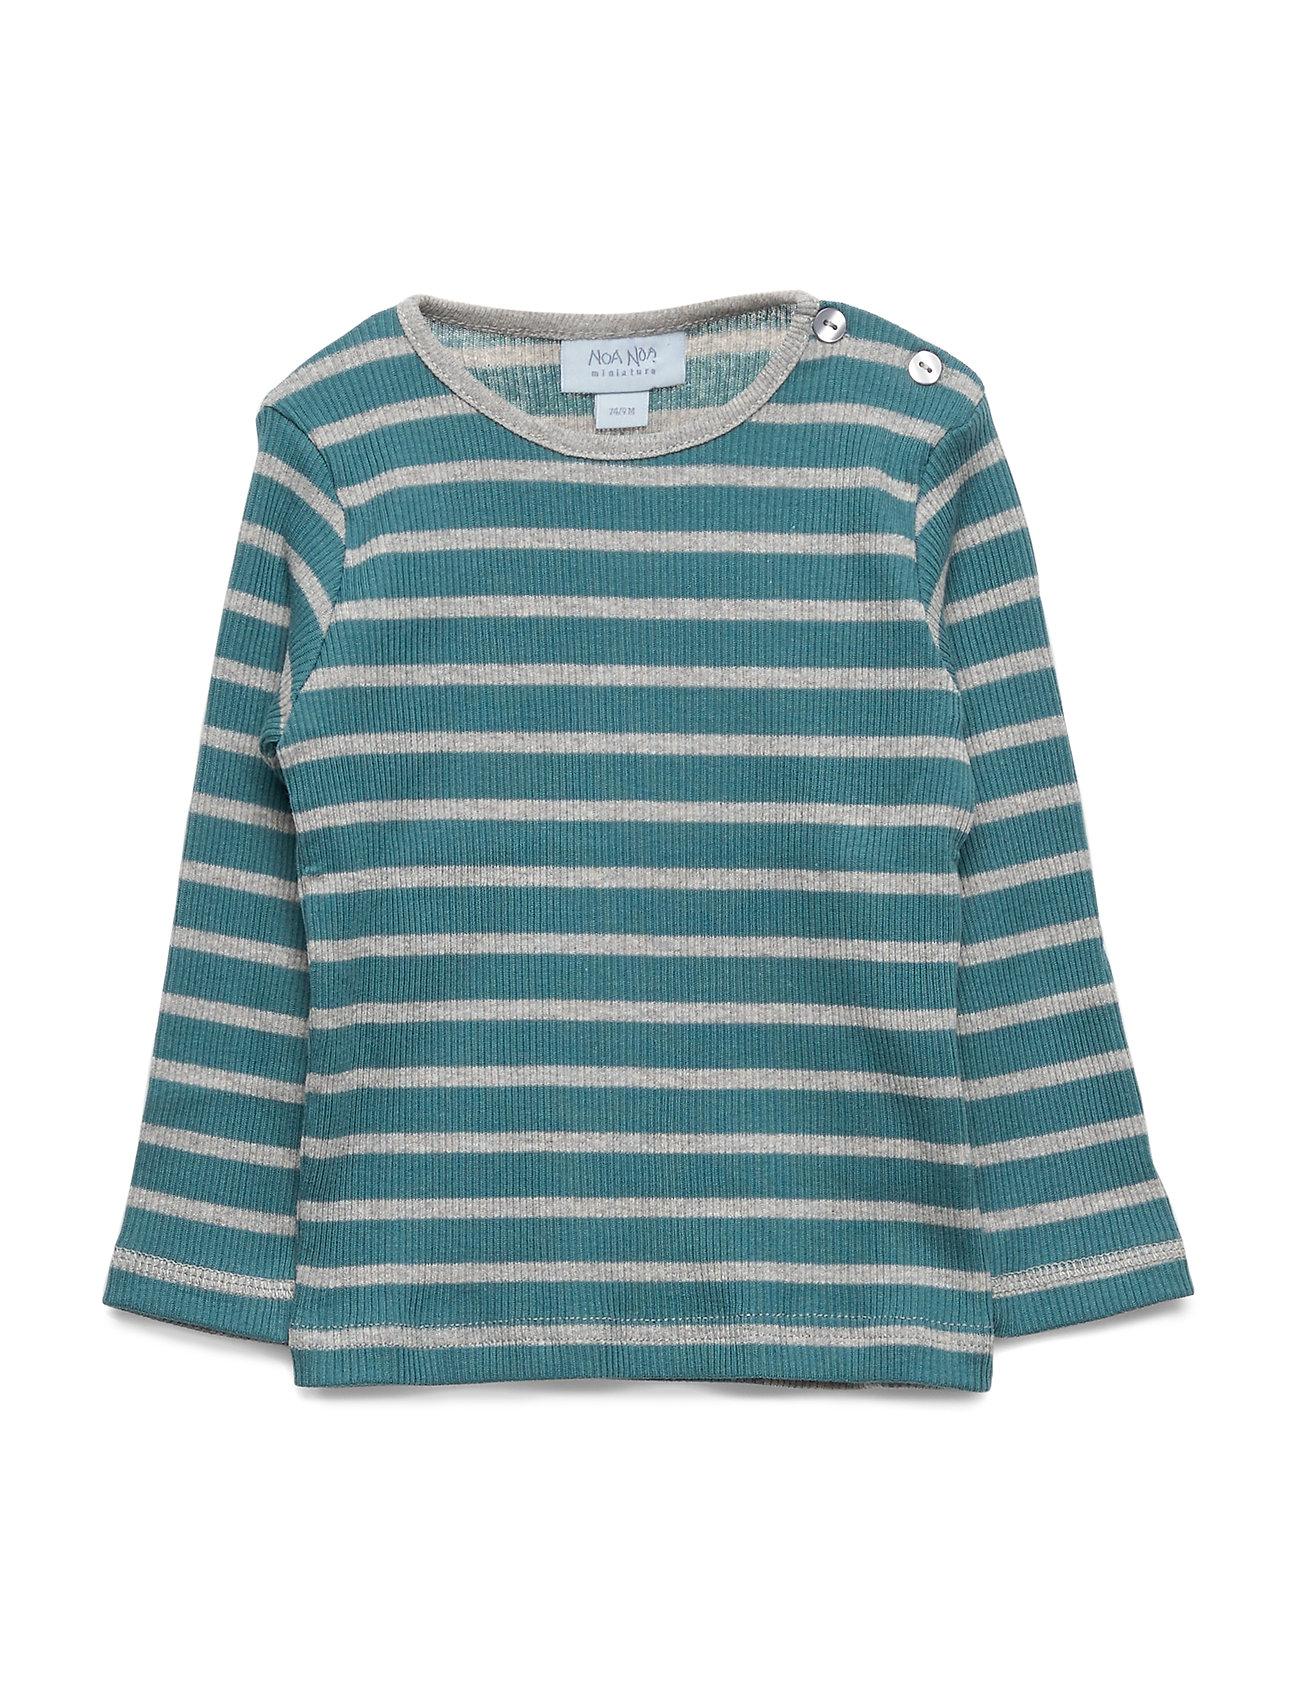 Noa Noa Miniature T-shirt - HYDRO